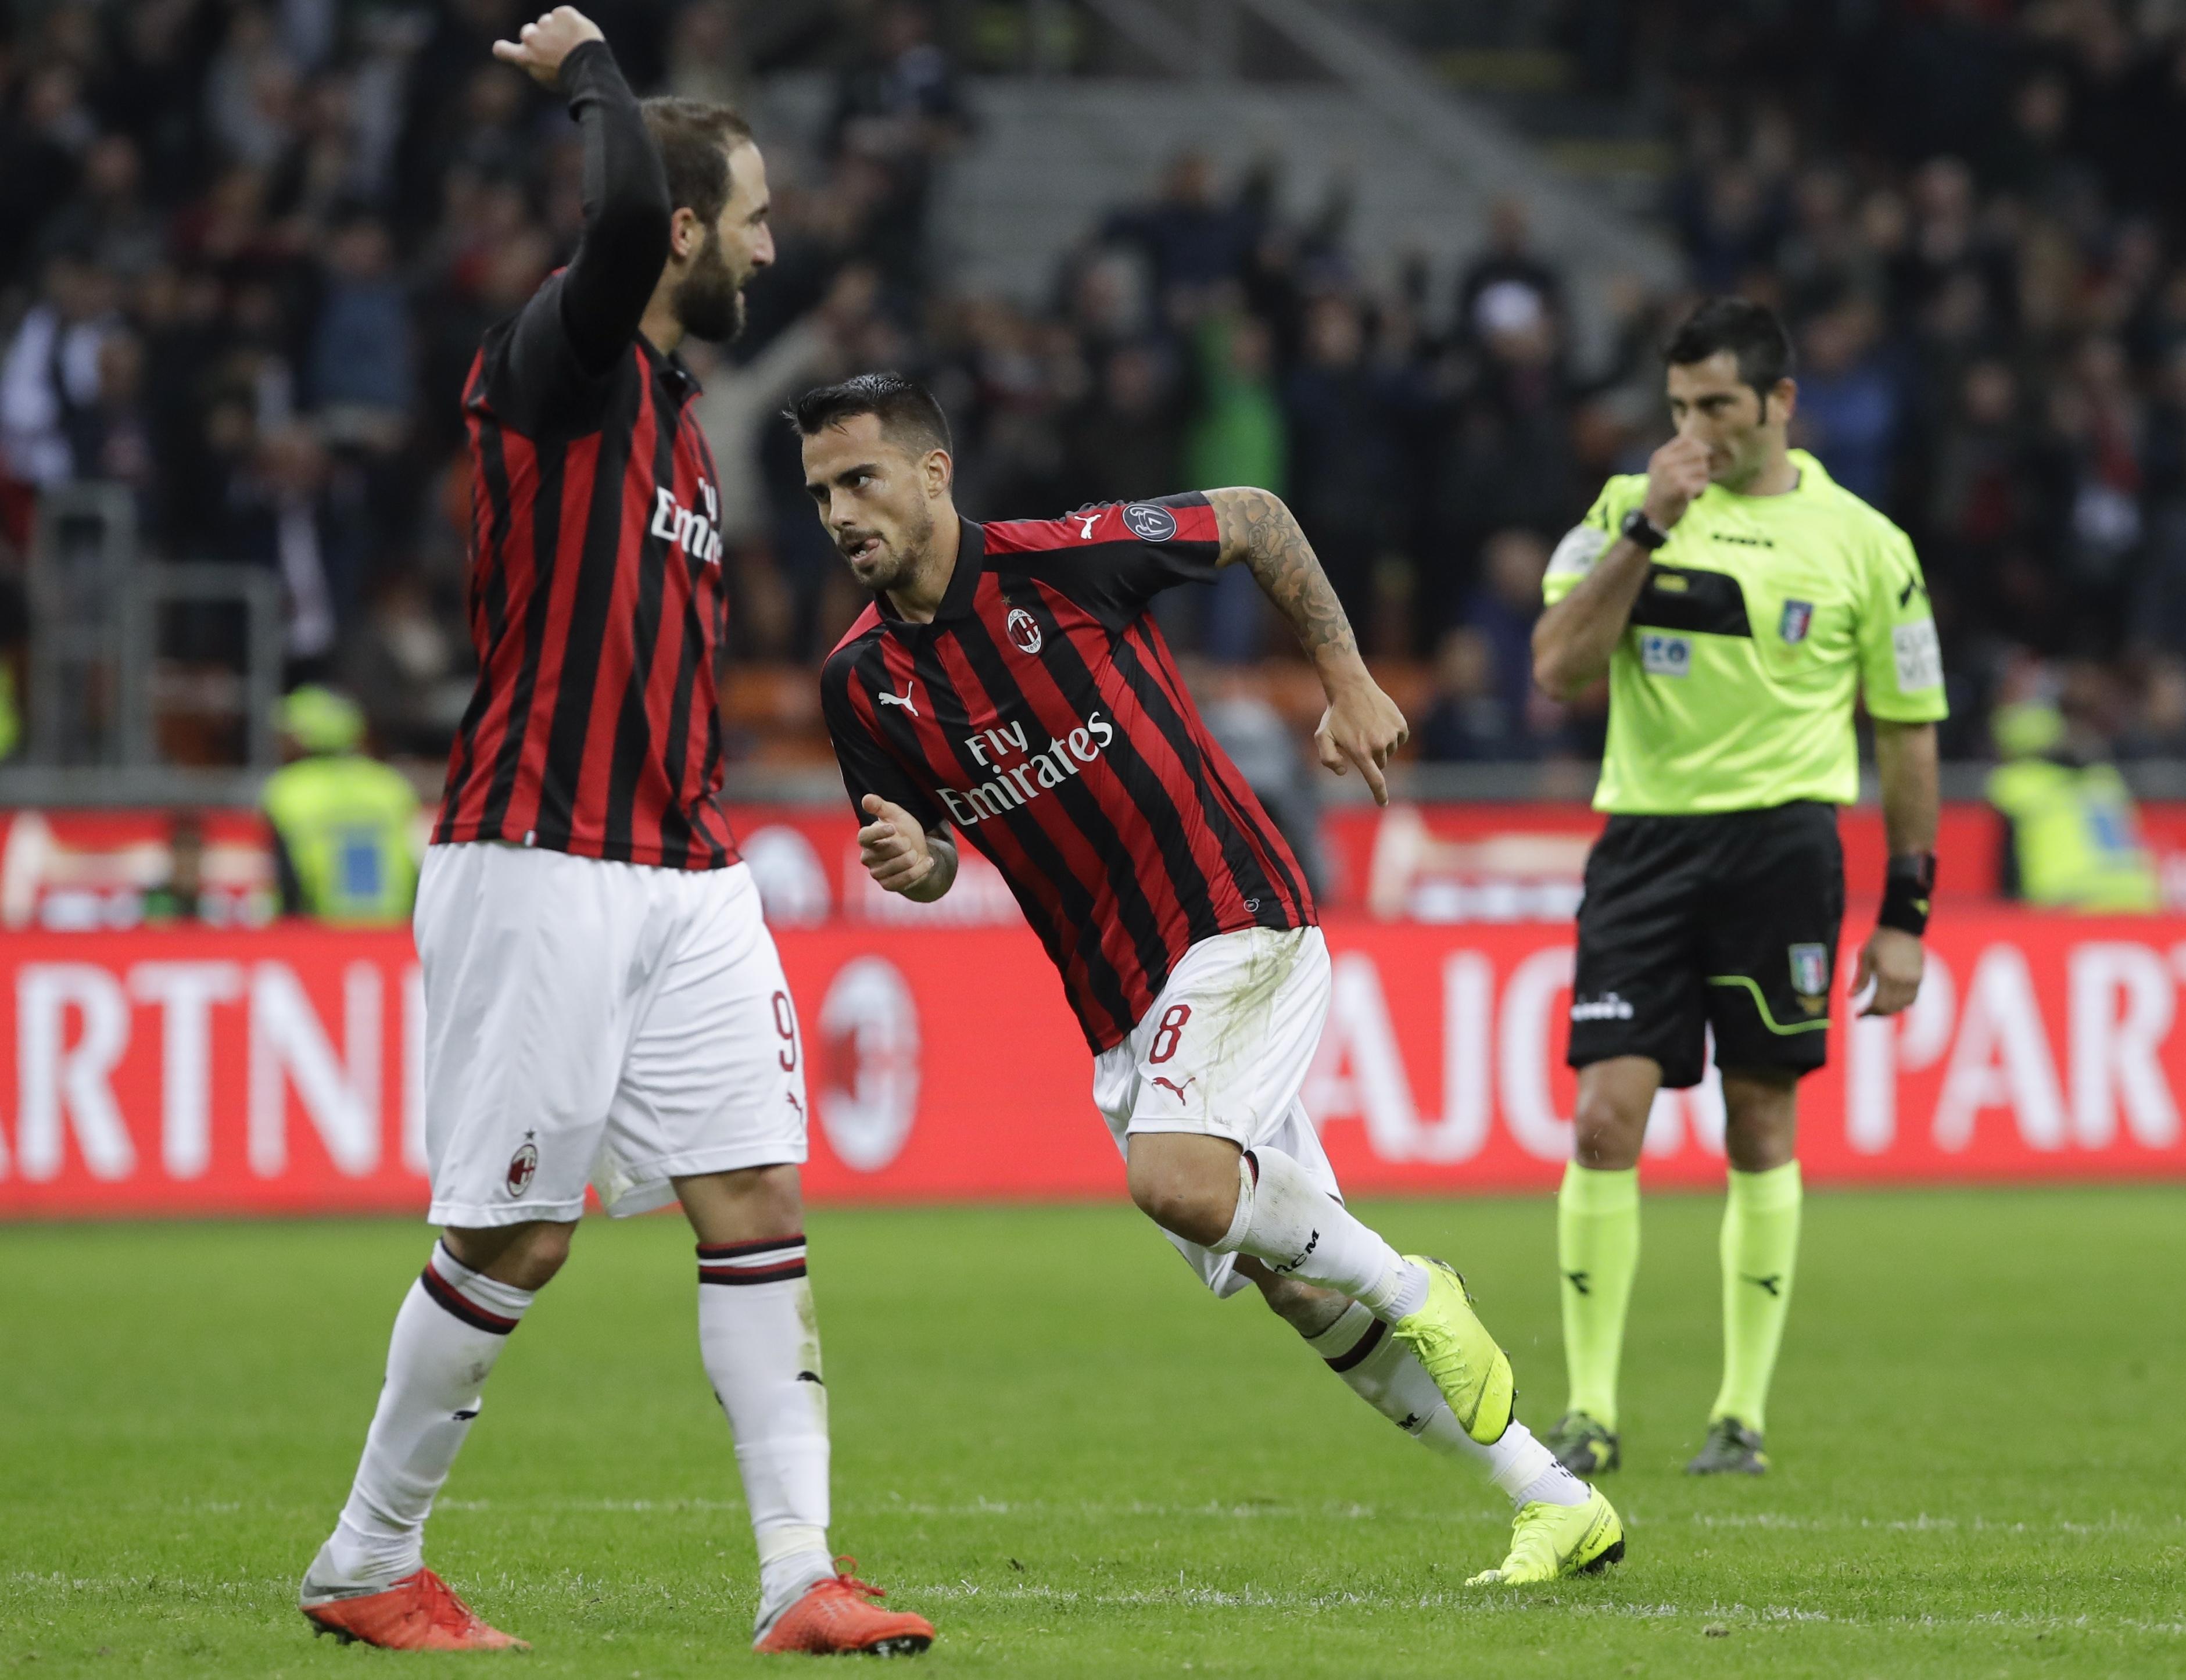 Suso's stunning strike gives AC Milan 3-2 win over Sampdoria